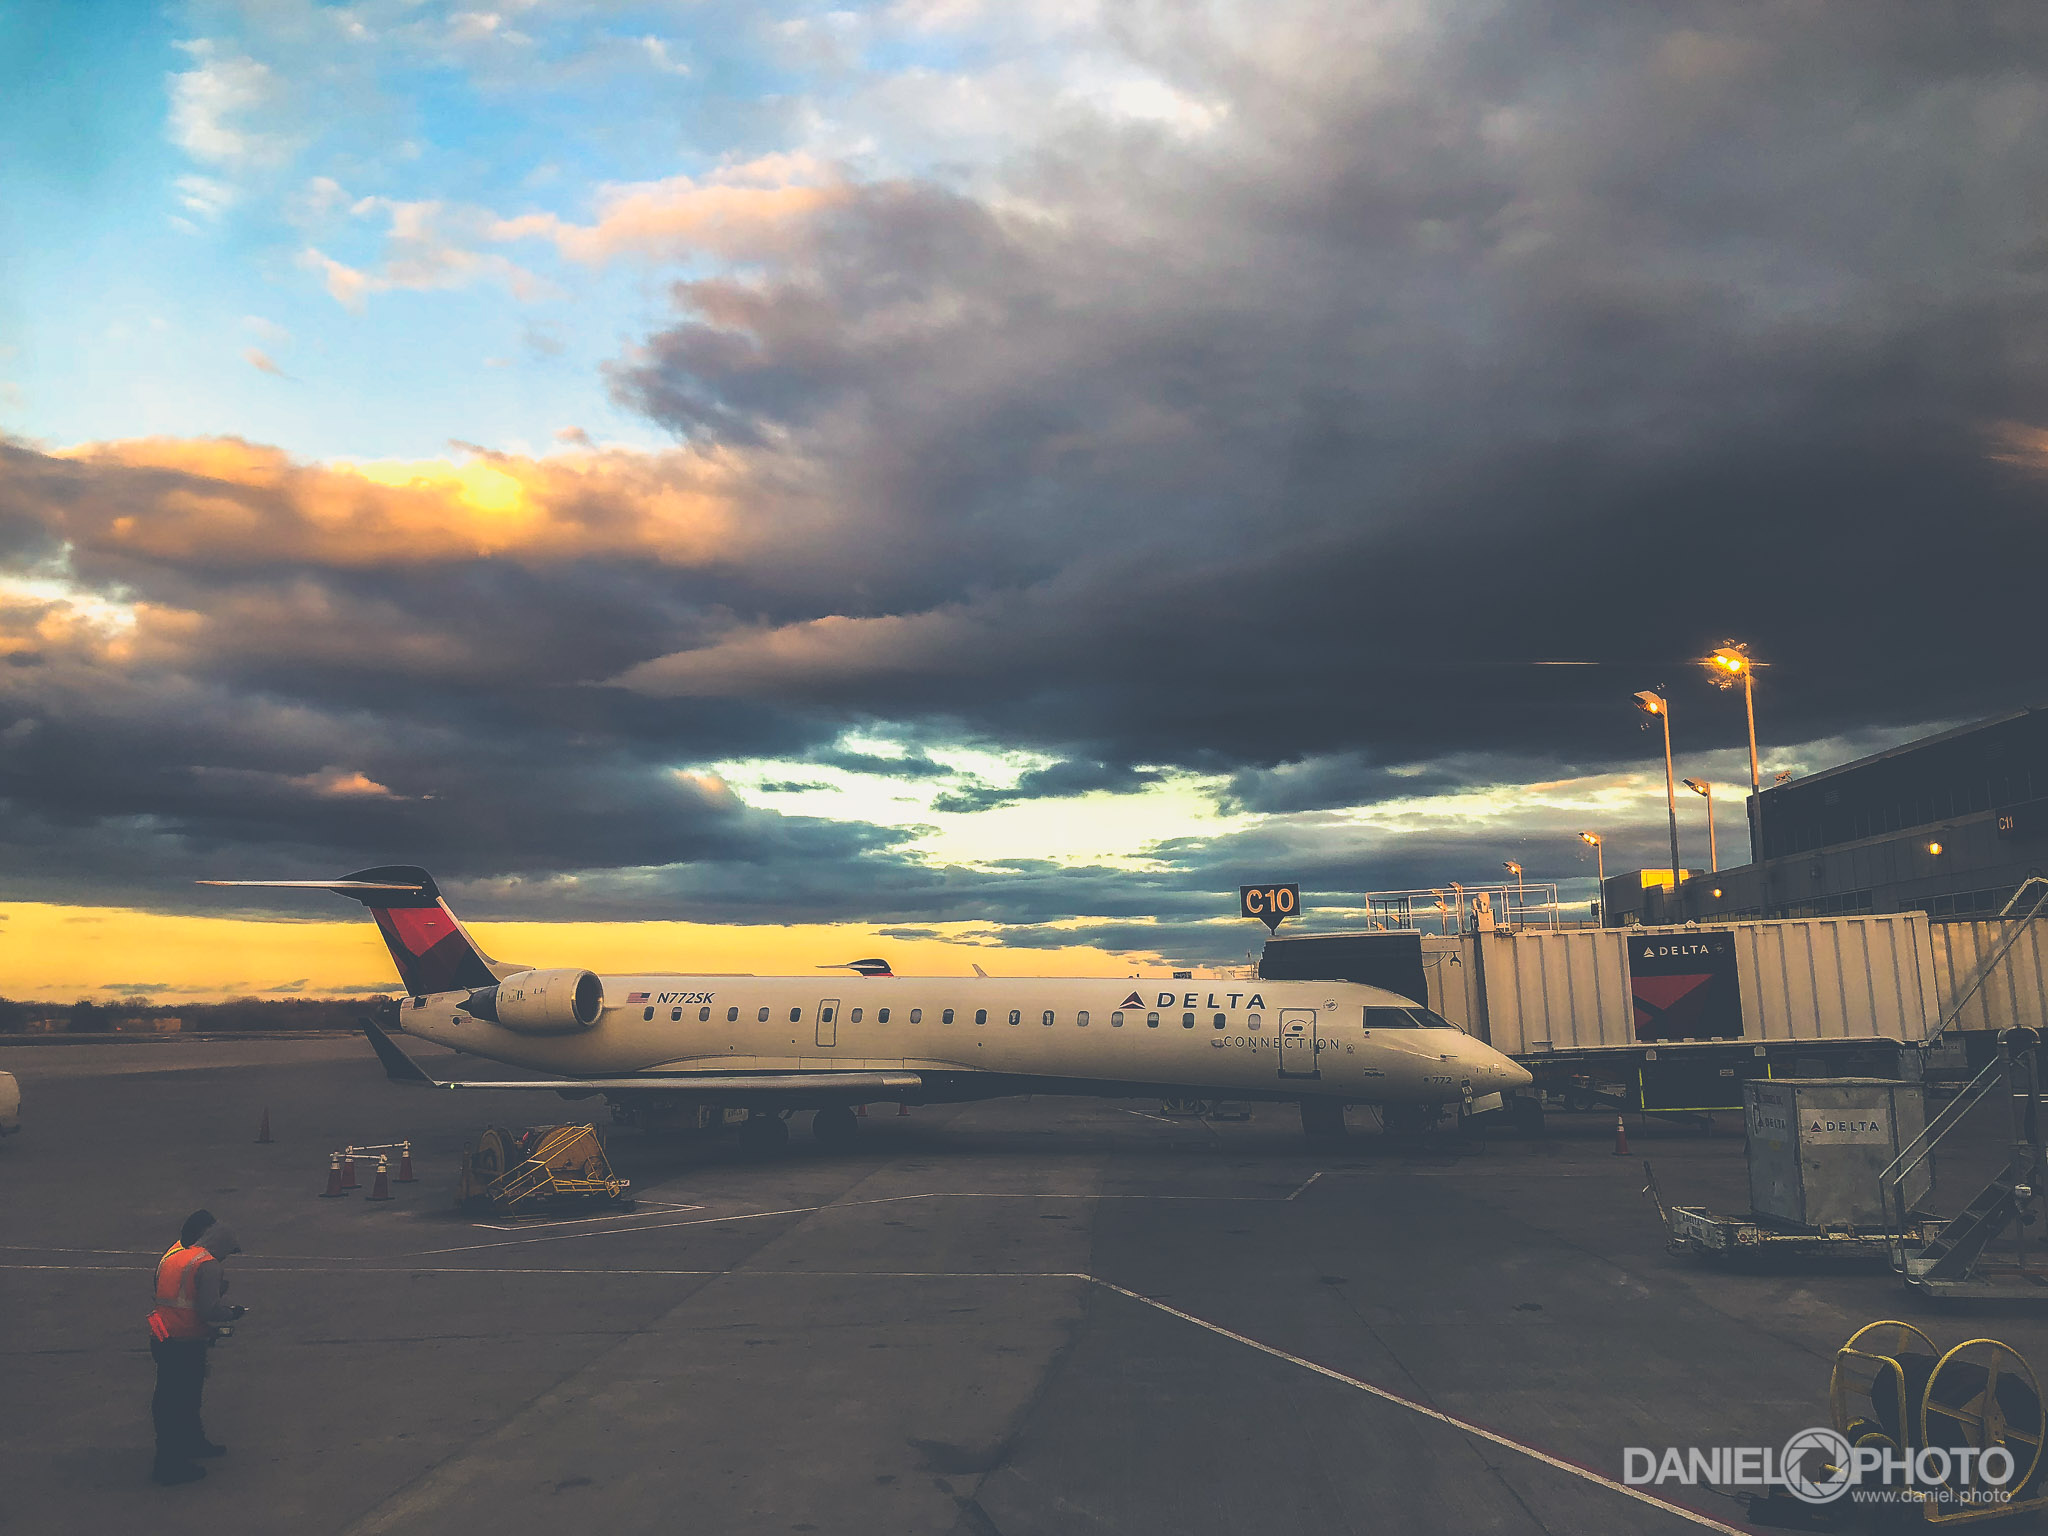 daniel-hedrick-delta-airlines-2033.jpg